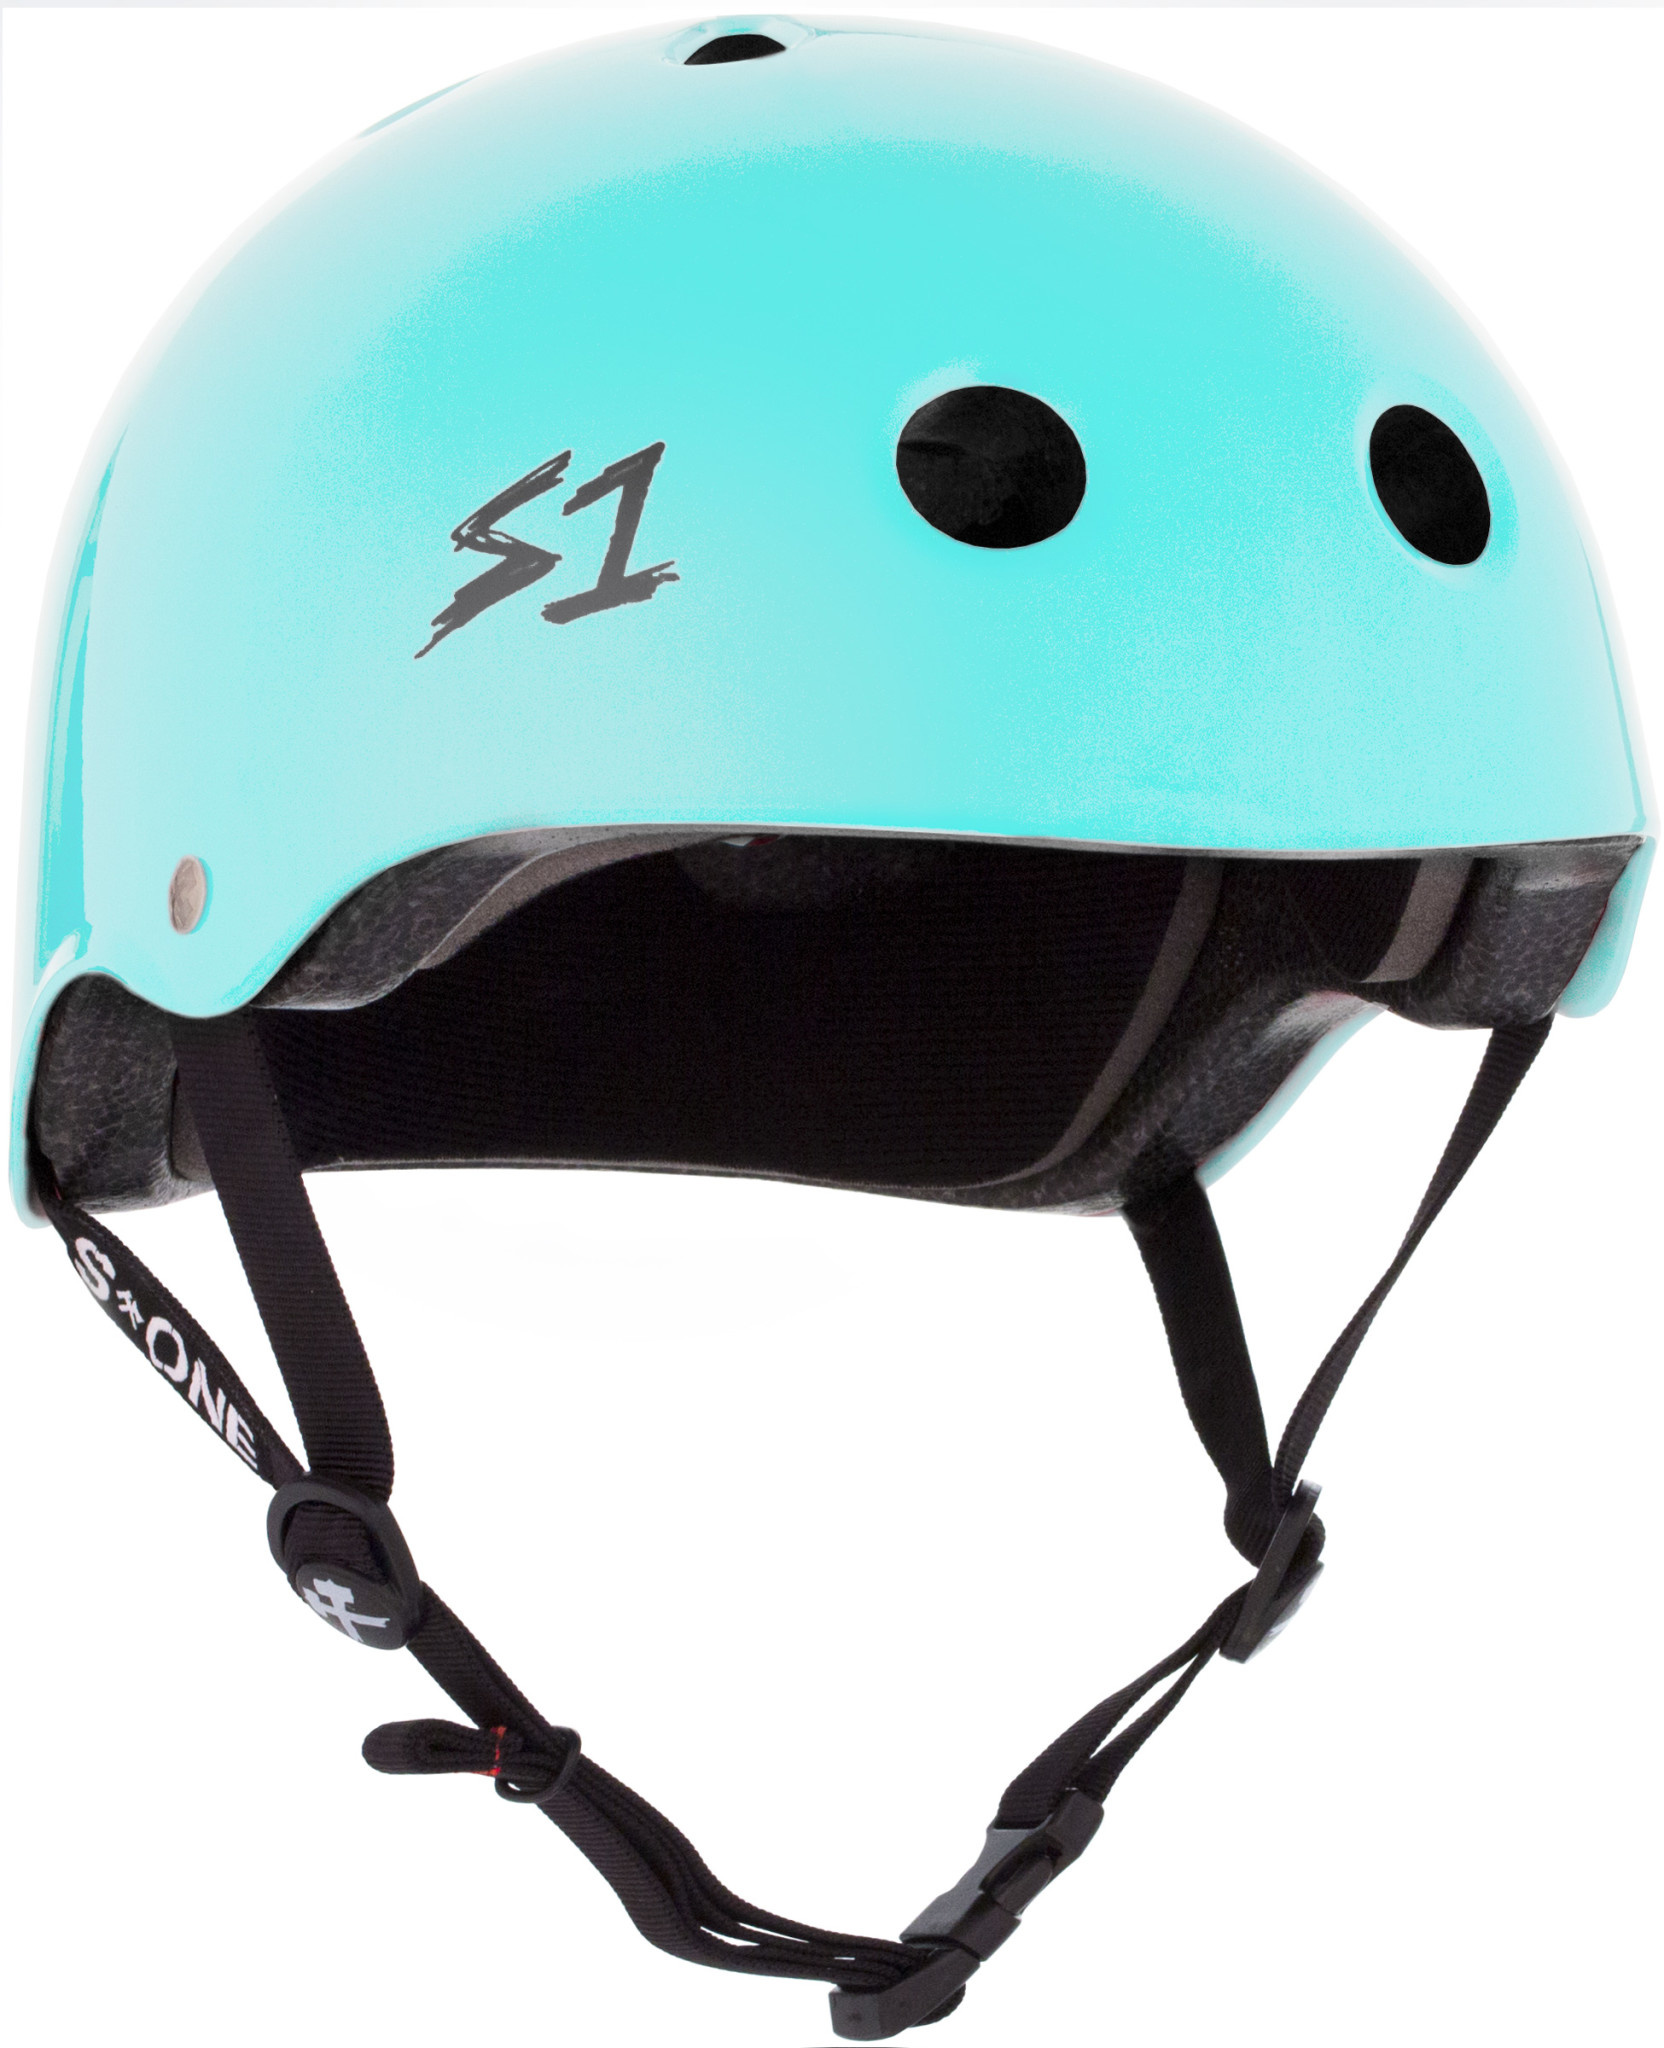 S-1 Lifer Helmet - Lagoon Gloss